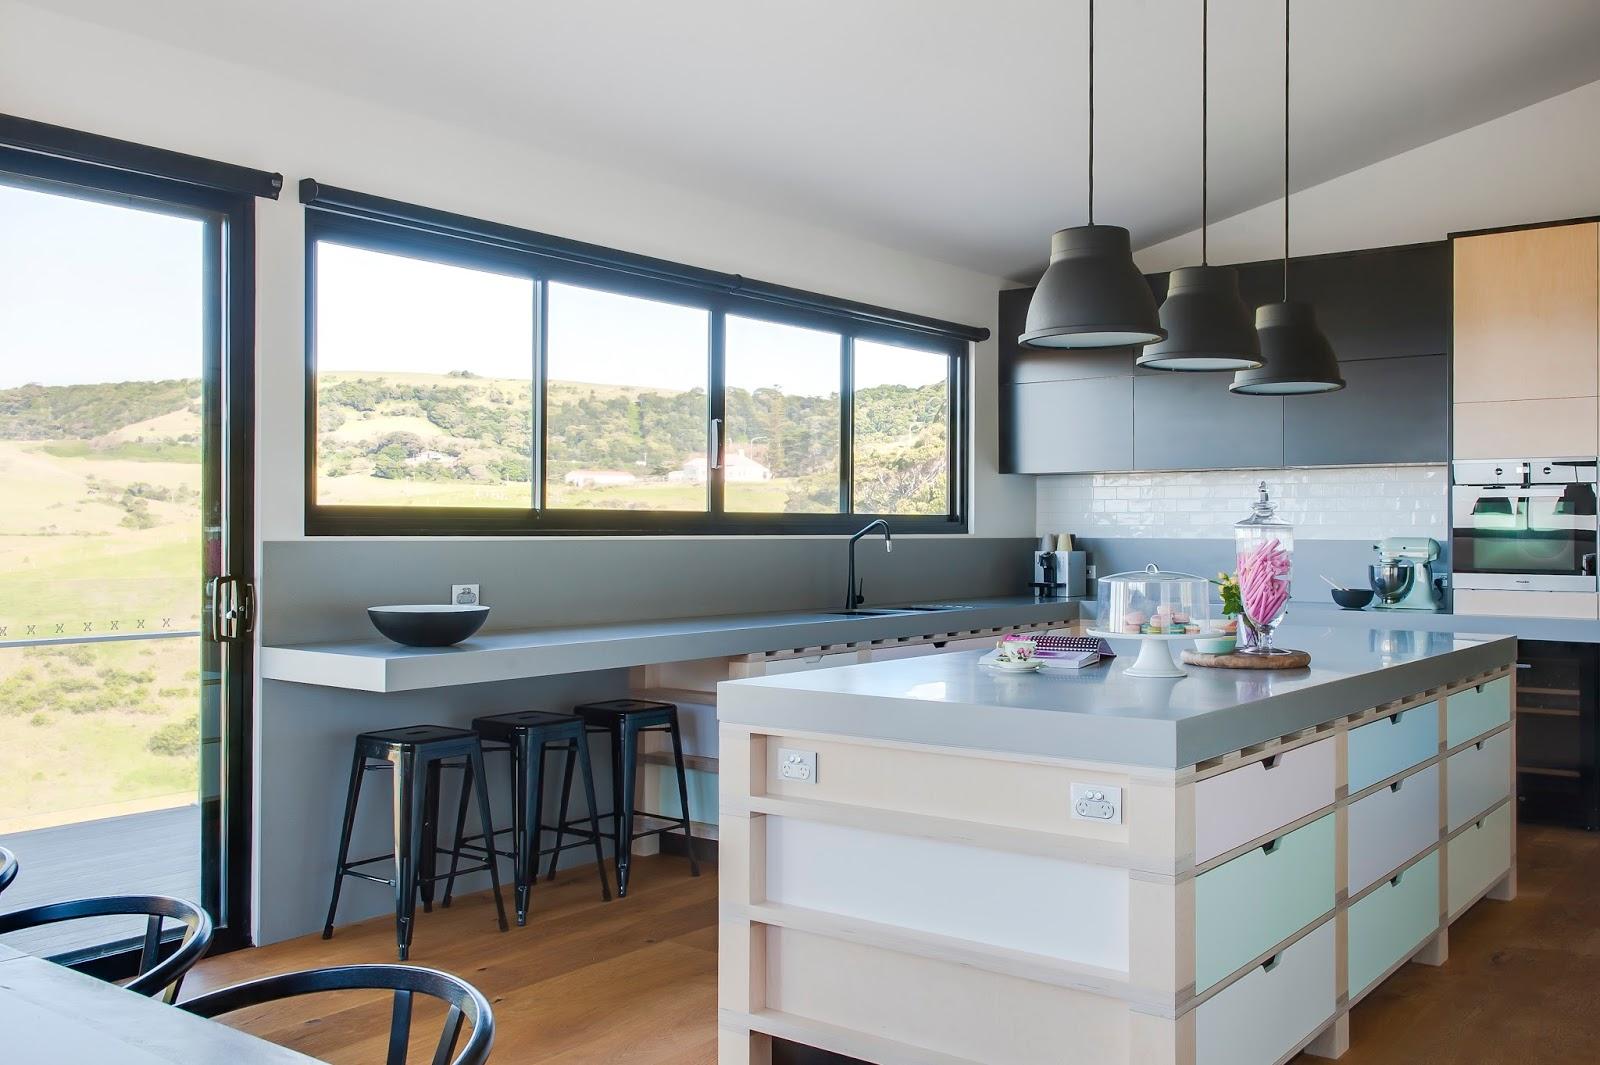 minosa award winning kitchen design palette construction song different wow corian plywood kiama holiday house%2b%25283%2529